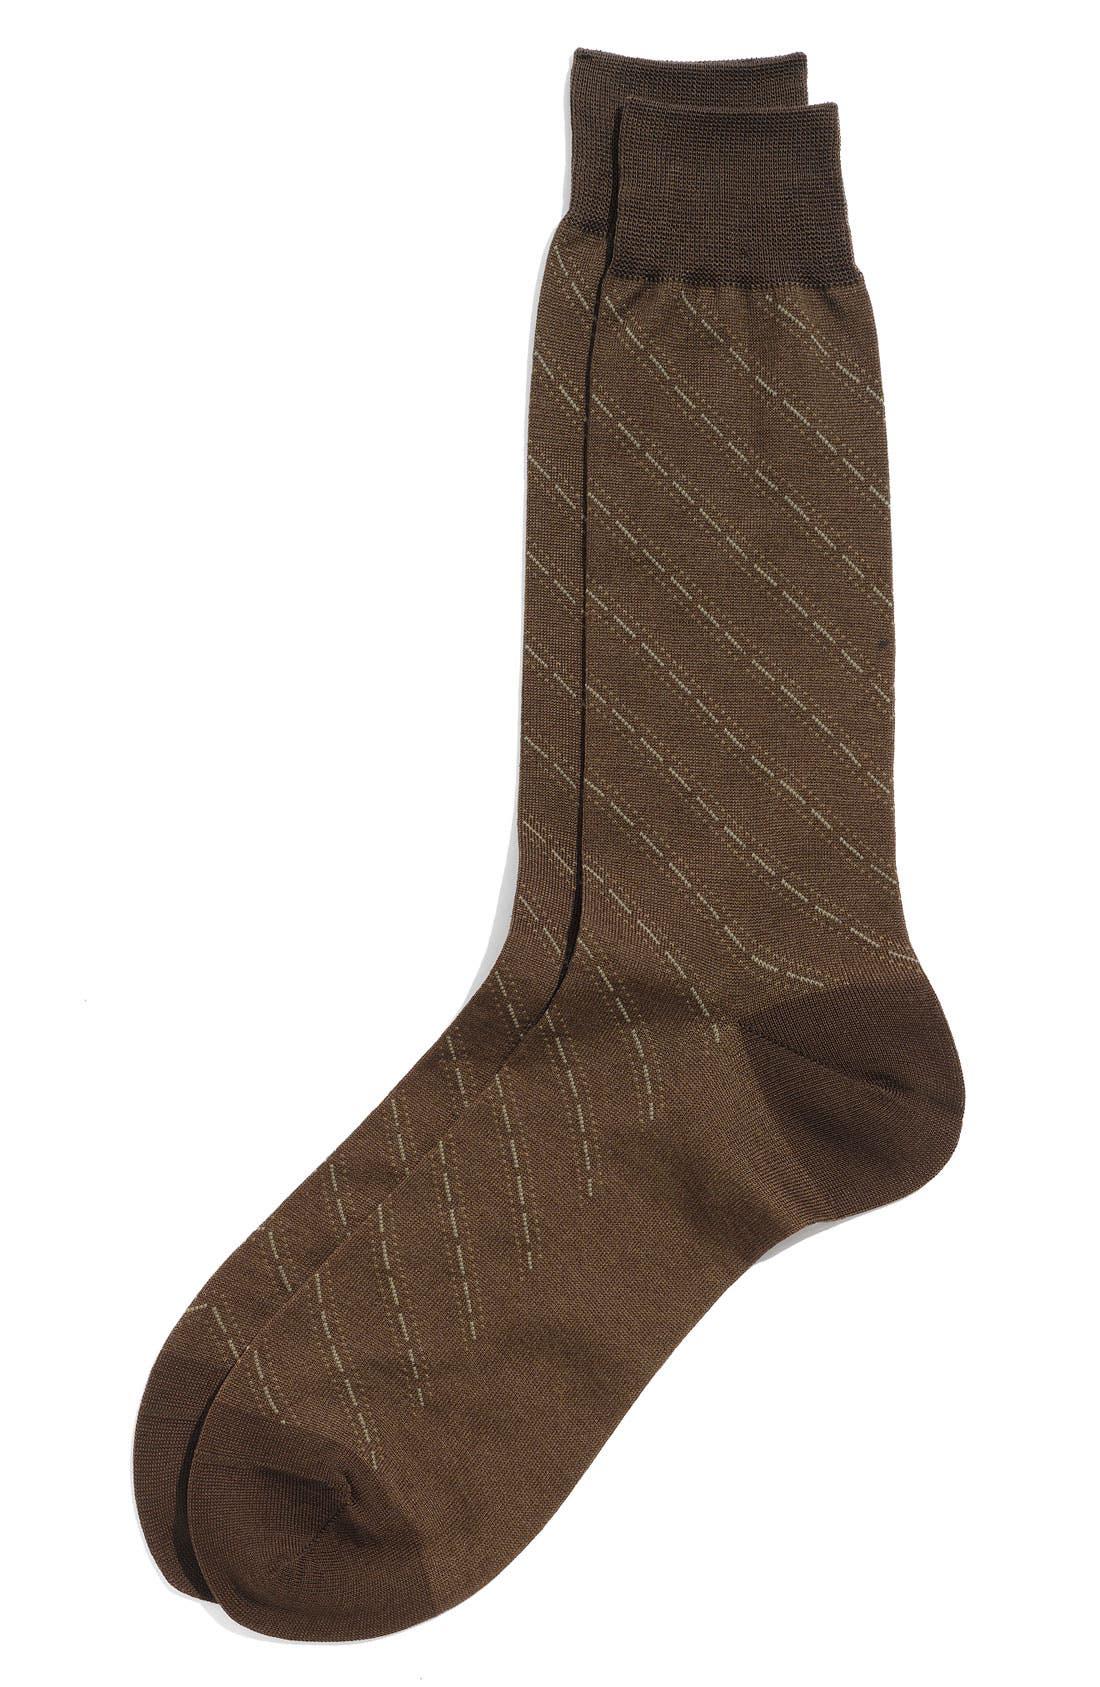 Alternate Image 1 Selected - Nordstrom Thick Diagonal Dash Socks